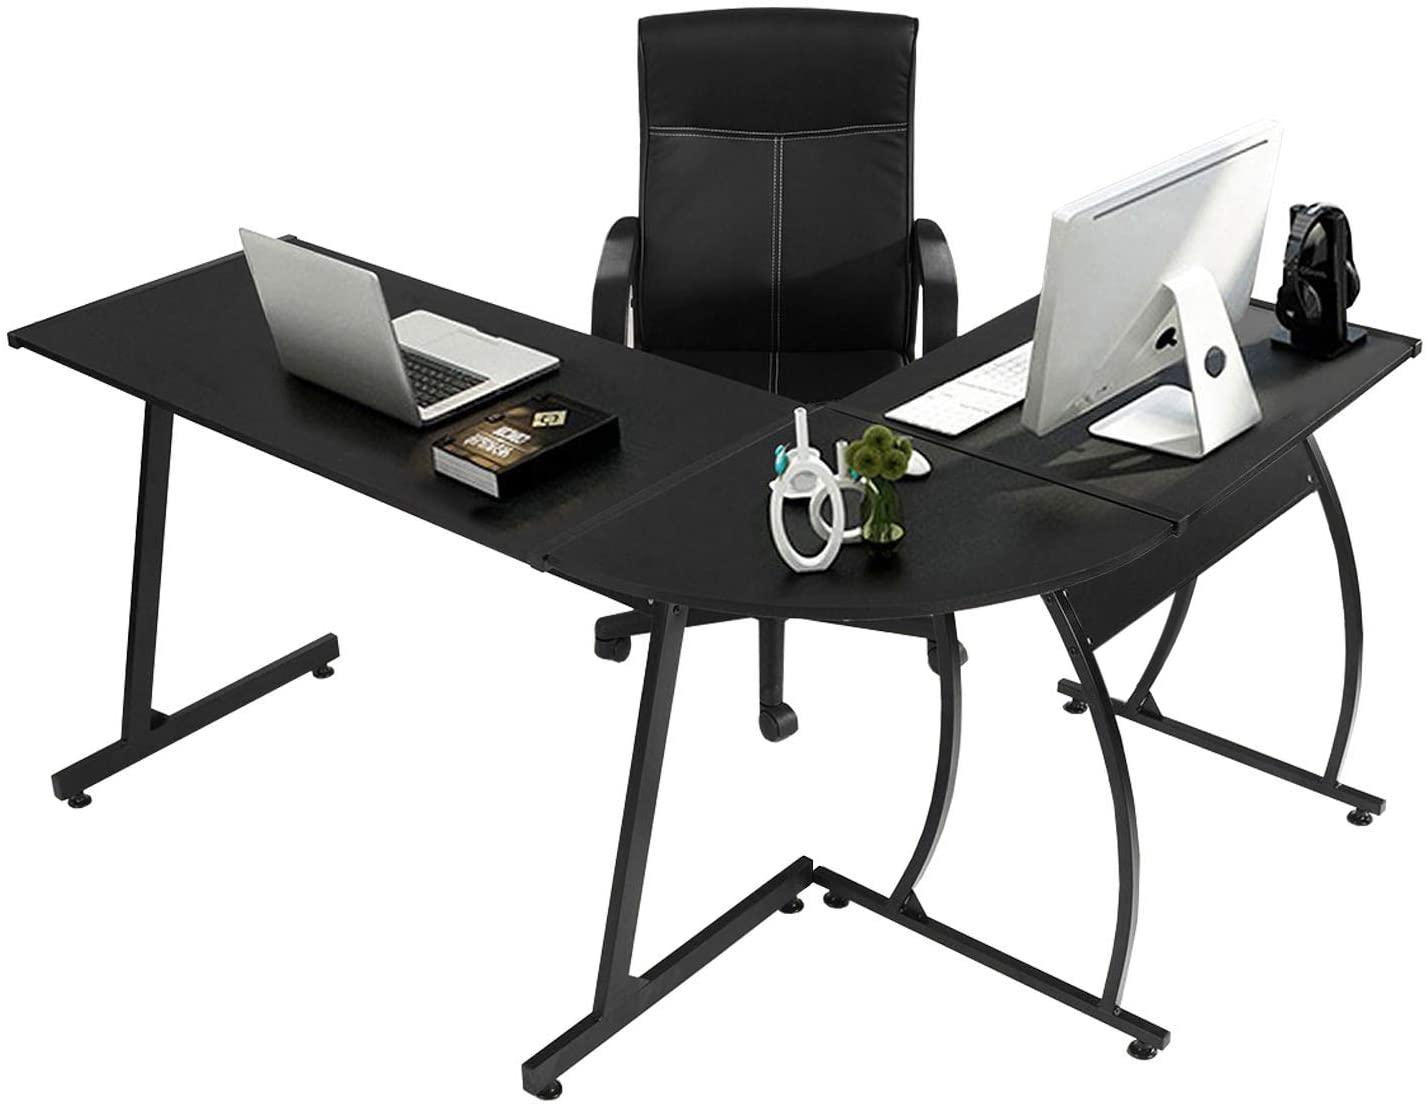 GreenForest L-Shaped Corner Desk Computer Gaming Desk PC Table,Home Office Writing Workstation 3-Piece,Black